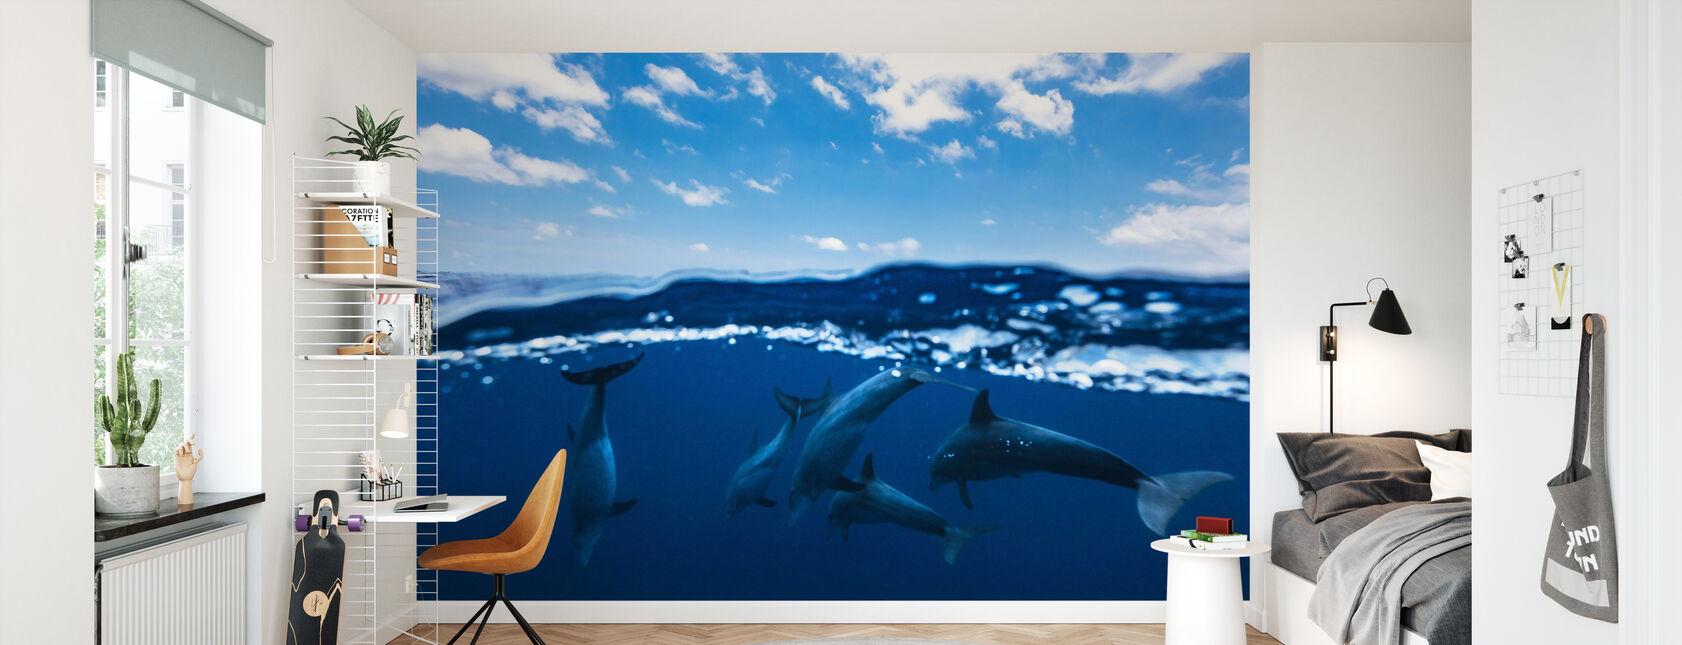 Between Air and Water - Wallpaper - Kids Room